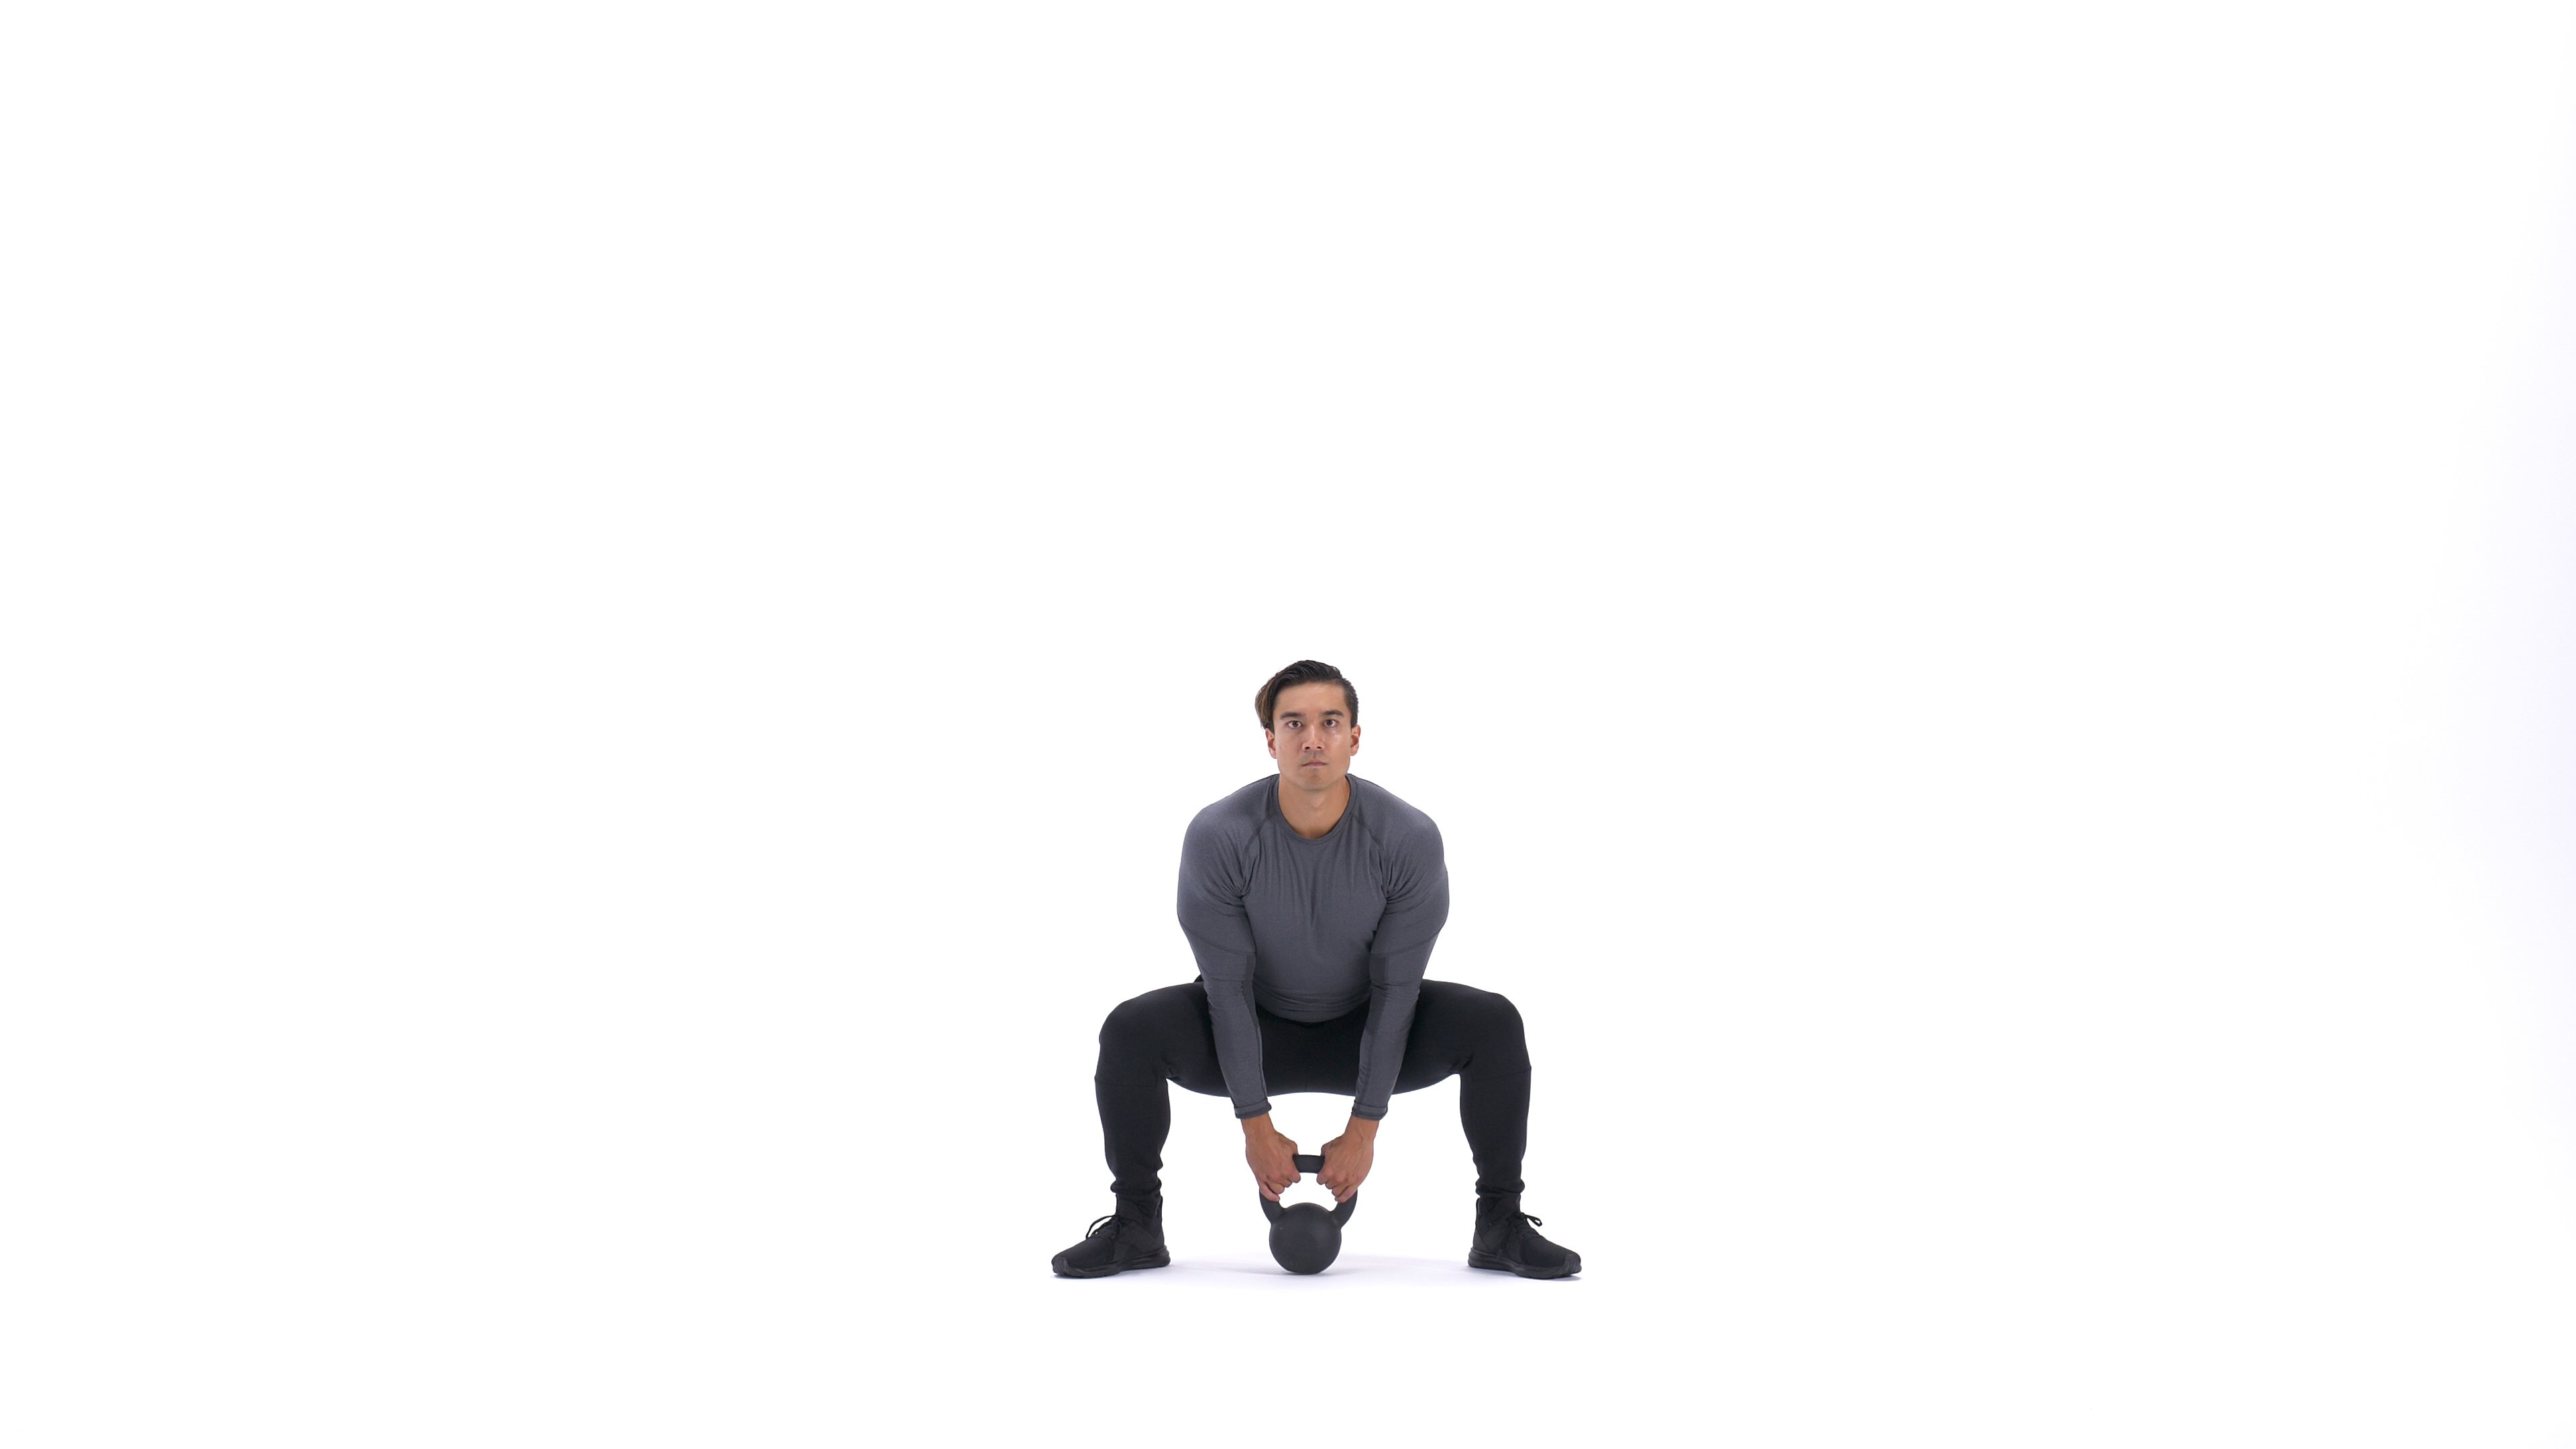 Kettlebell sumo squat image